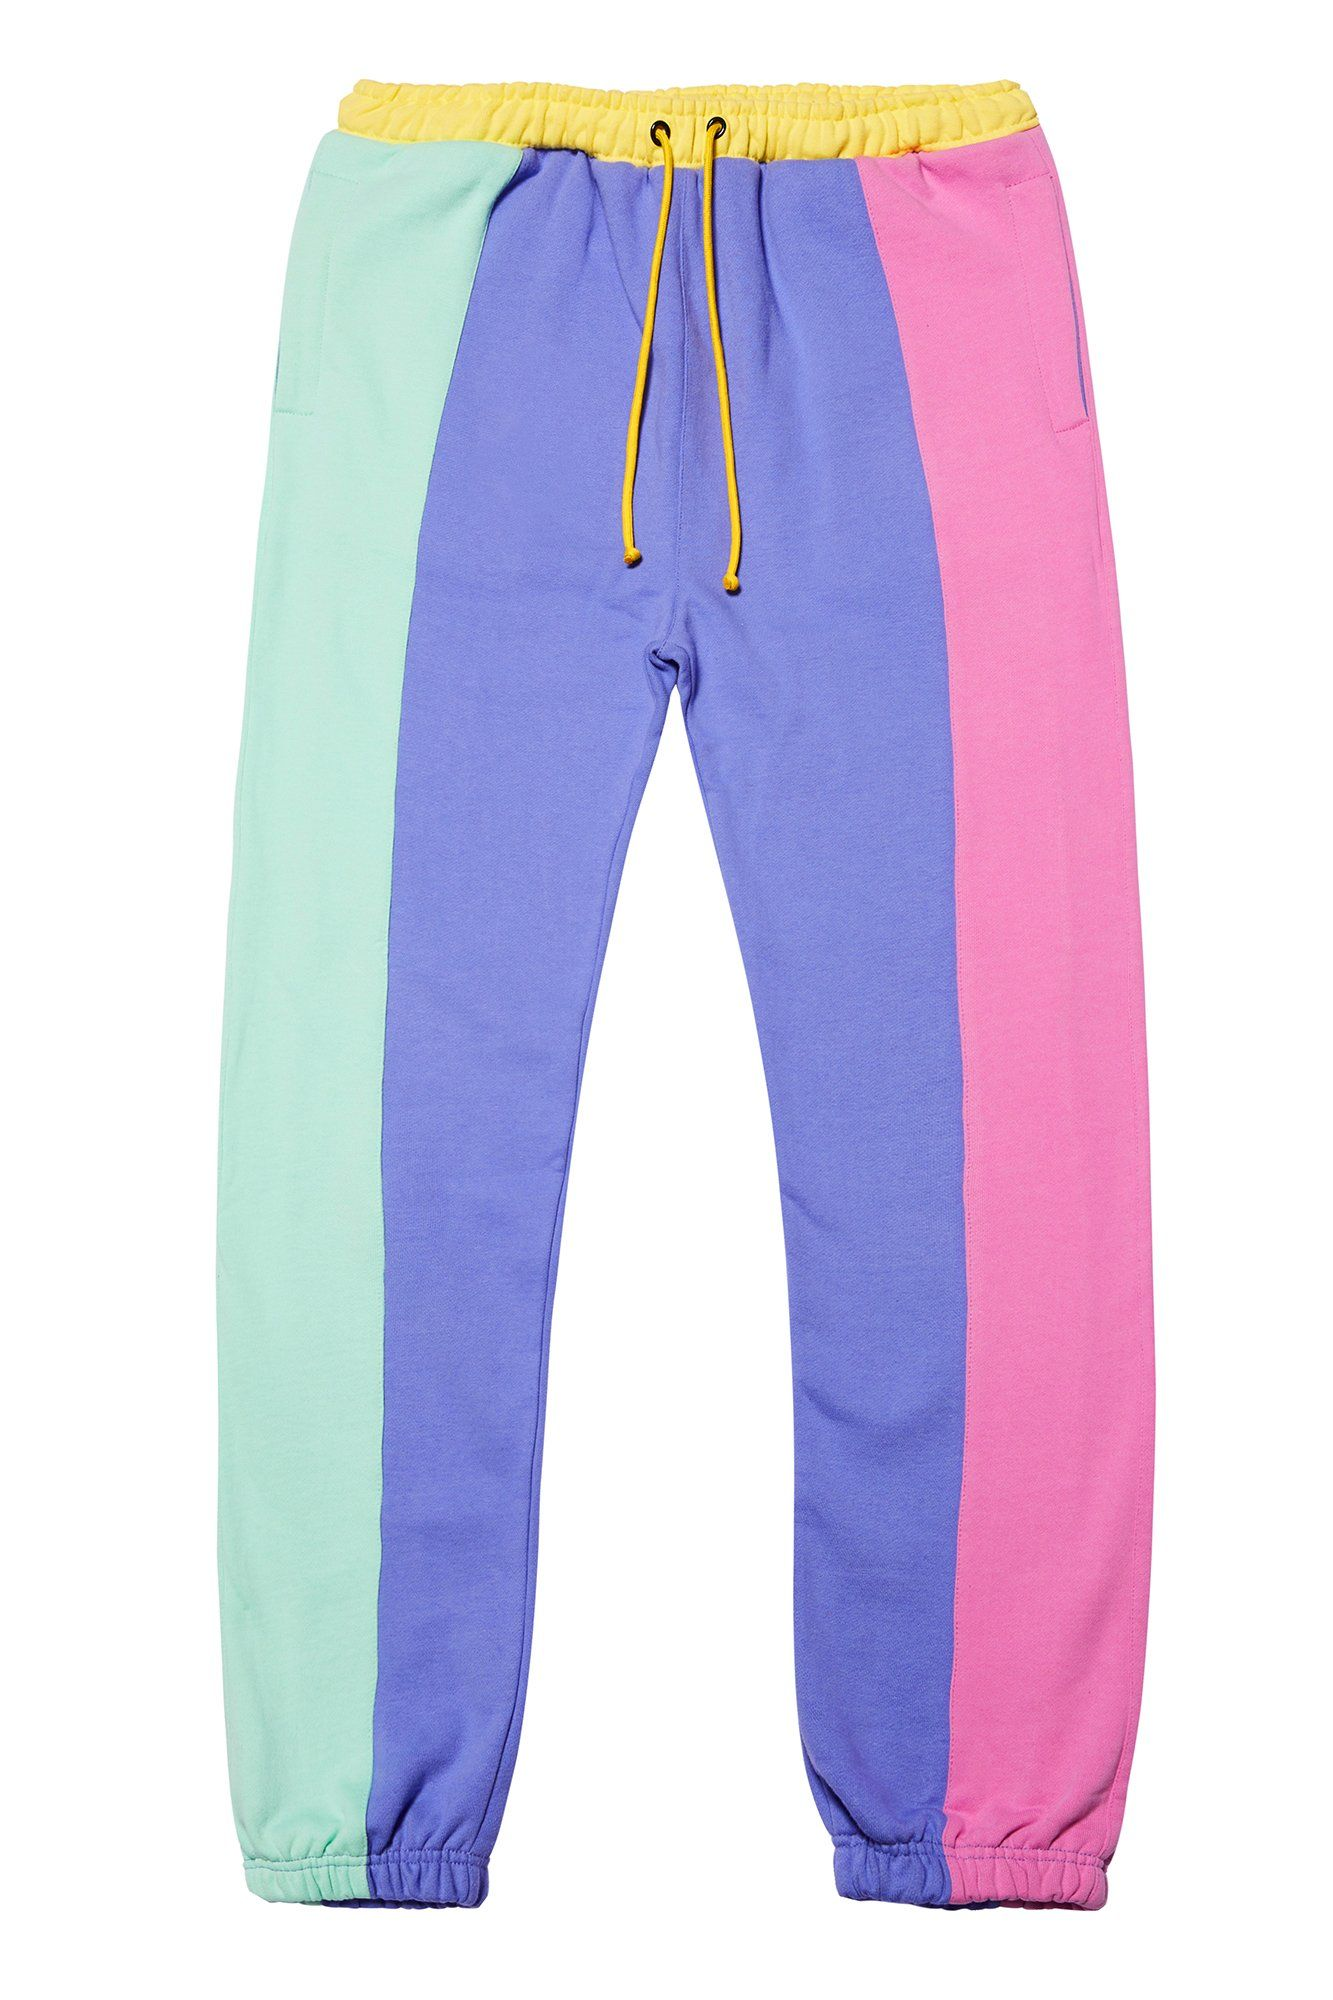 8f76c04c2da5d Pastel Color Block Jogger Pants in 2019 | Fashion | Jogger pants ...